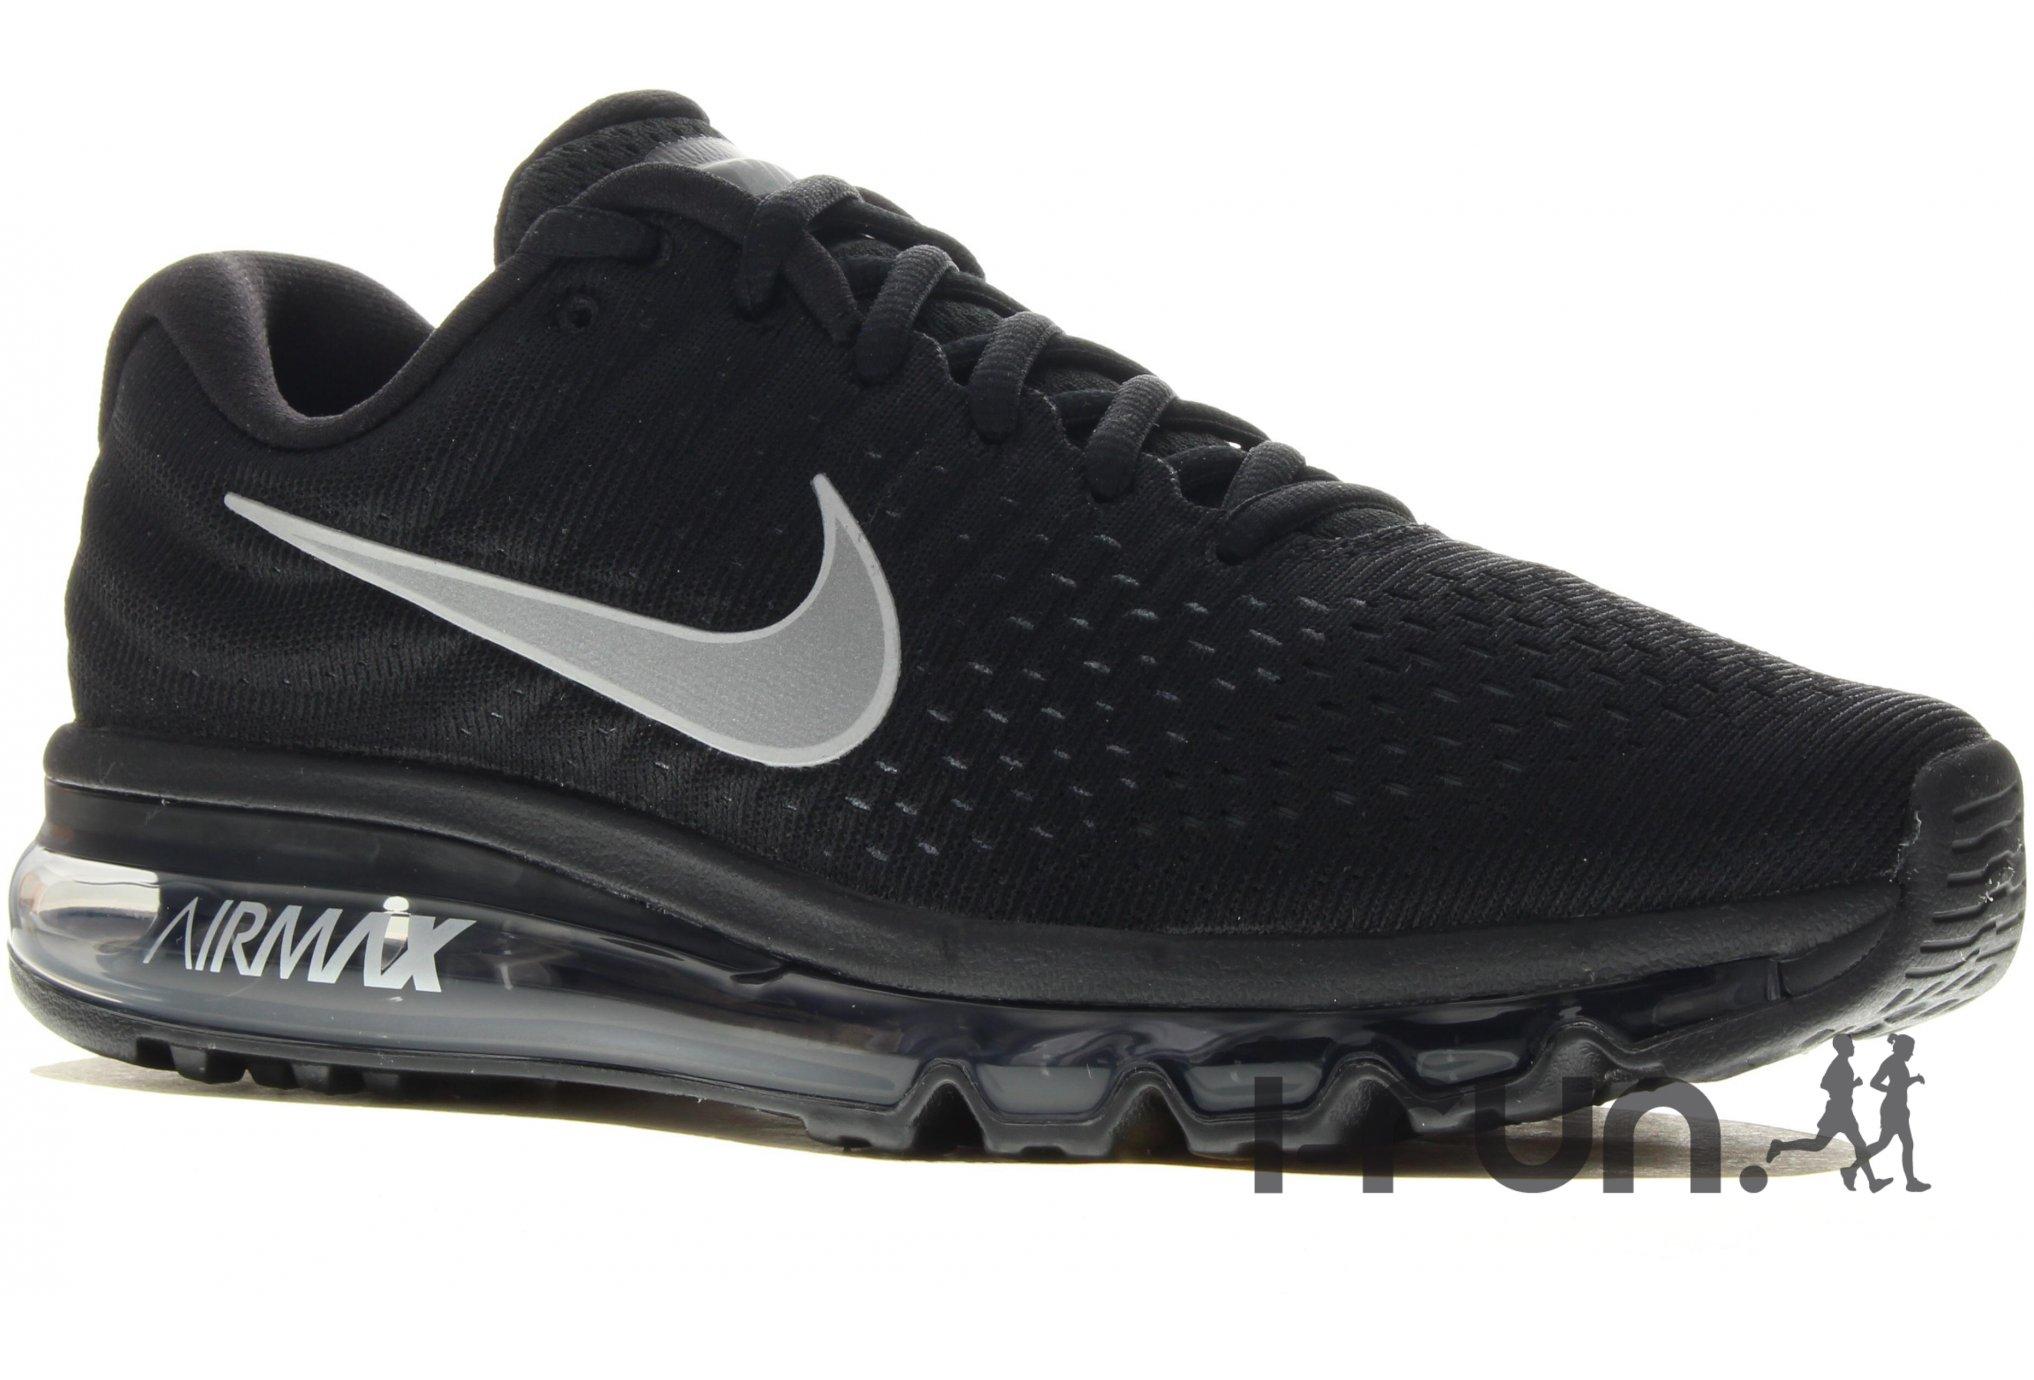 Nike Air Max 2017 W Chaussures running femme